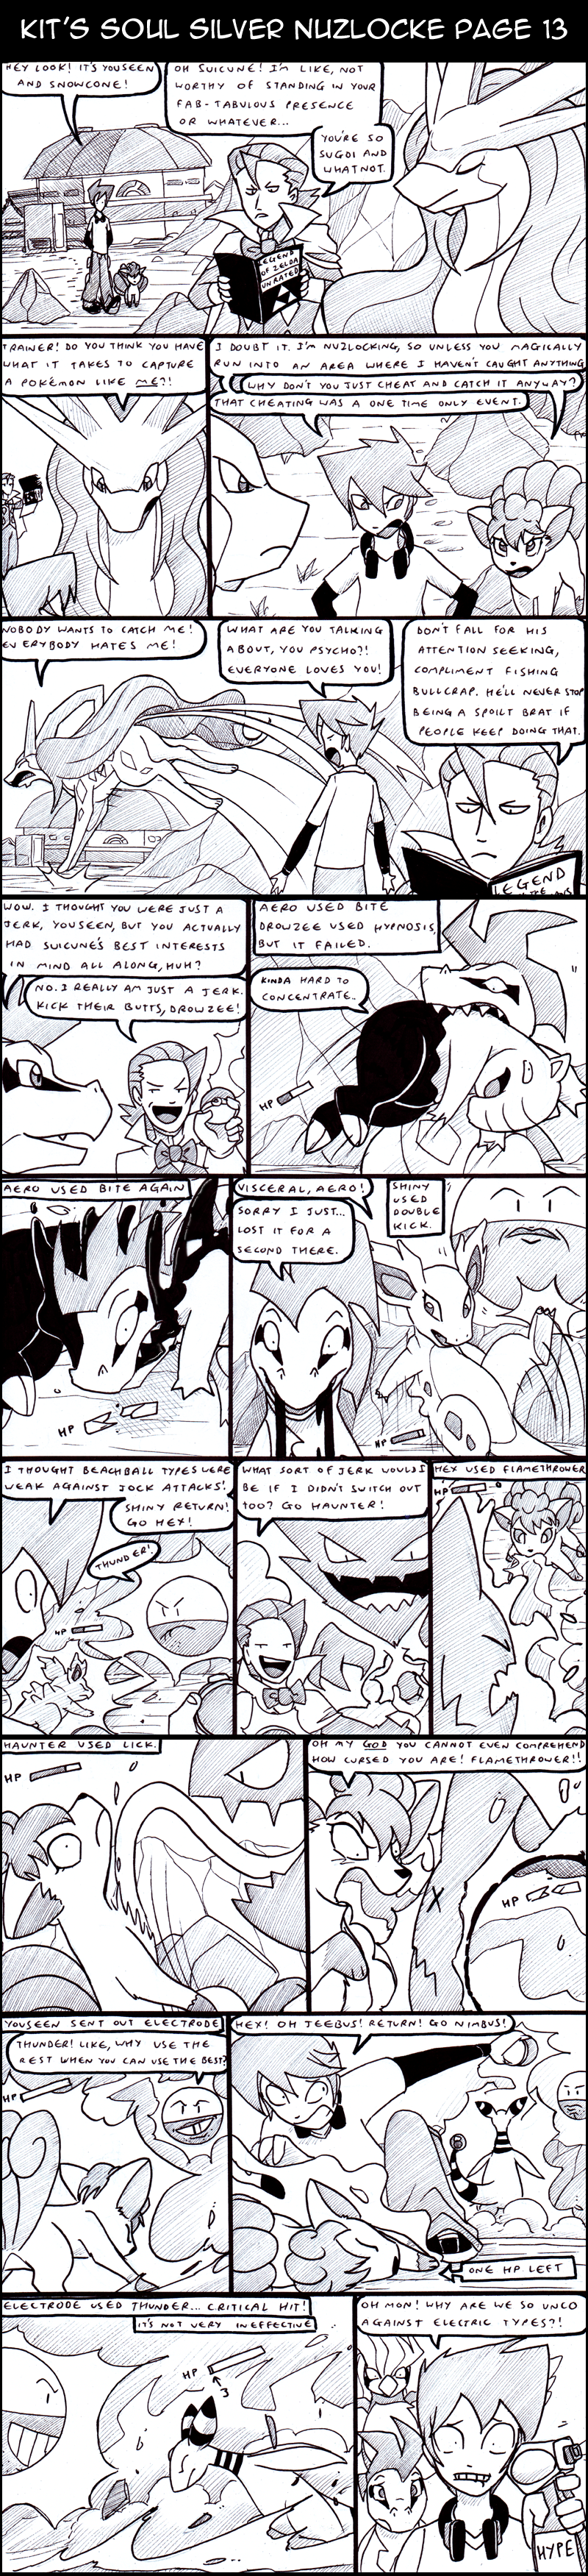 Kit's Soul Silver Nuzlocke page 13 by kitfox-crimson